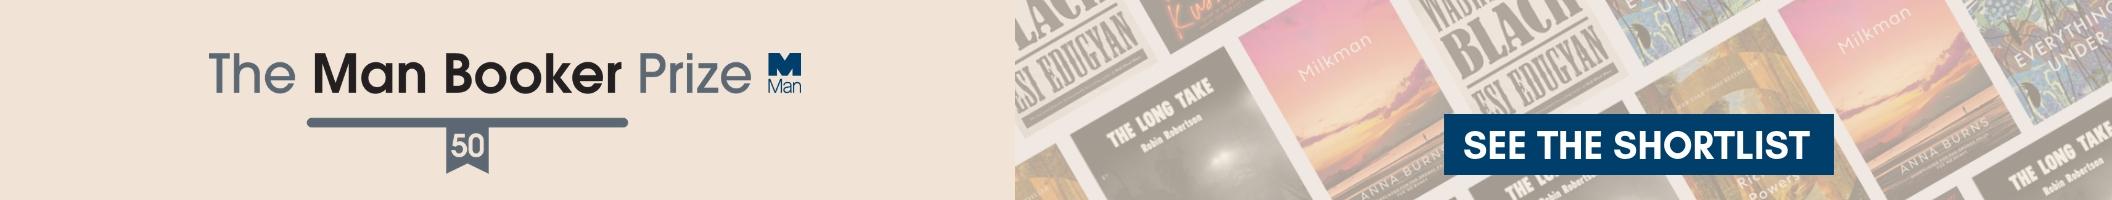 Man Booker Prize 2018 Shortlist Homepage Banner